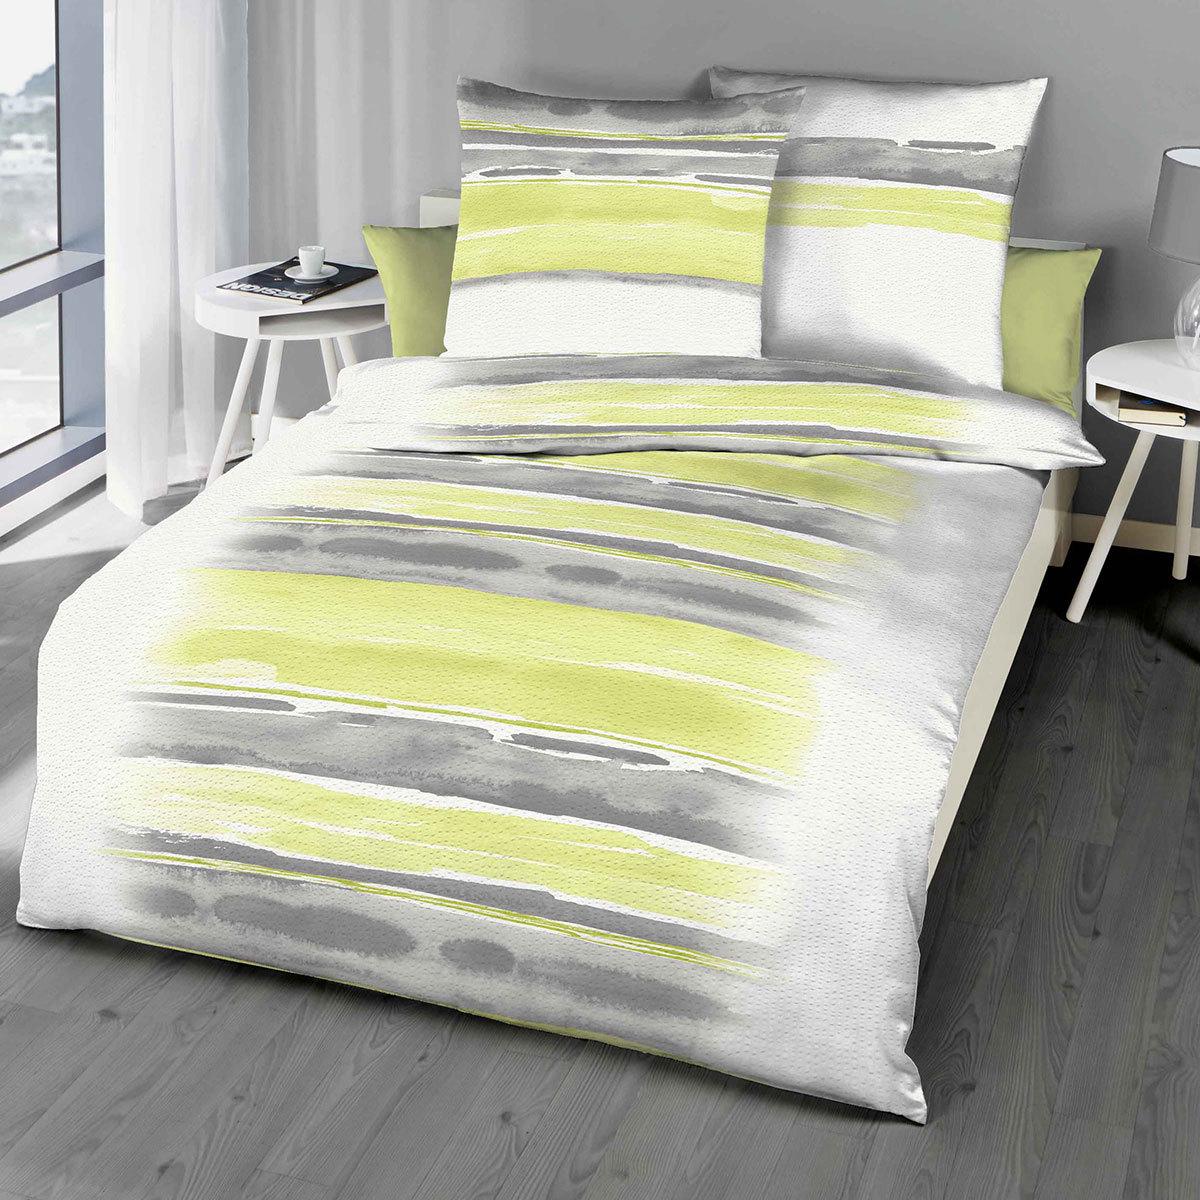 kaeppel seersucker bettw sche blend gr n g nstig online kaufen bei bettwaren shop. Black Bedroom Furniture Sets. Home Design Ideas